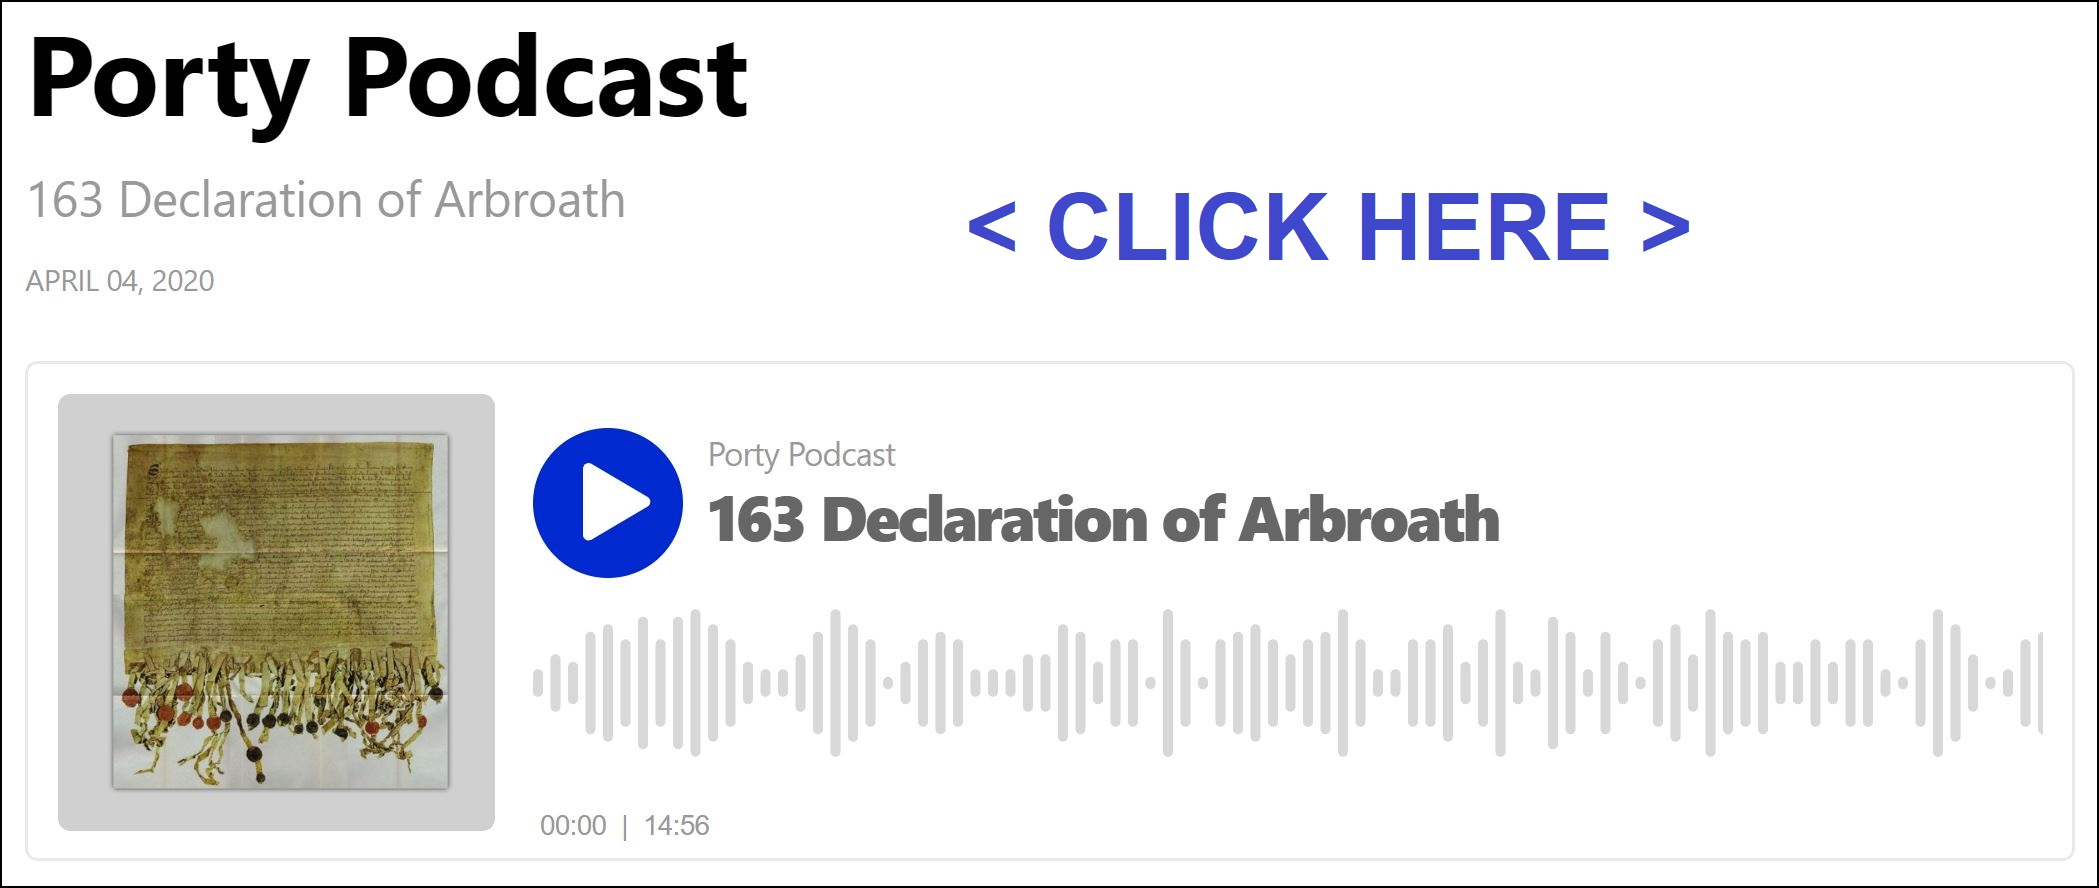 Porty Podcast - 163 Declaration of Arbroath